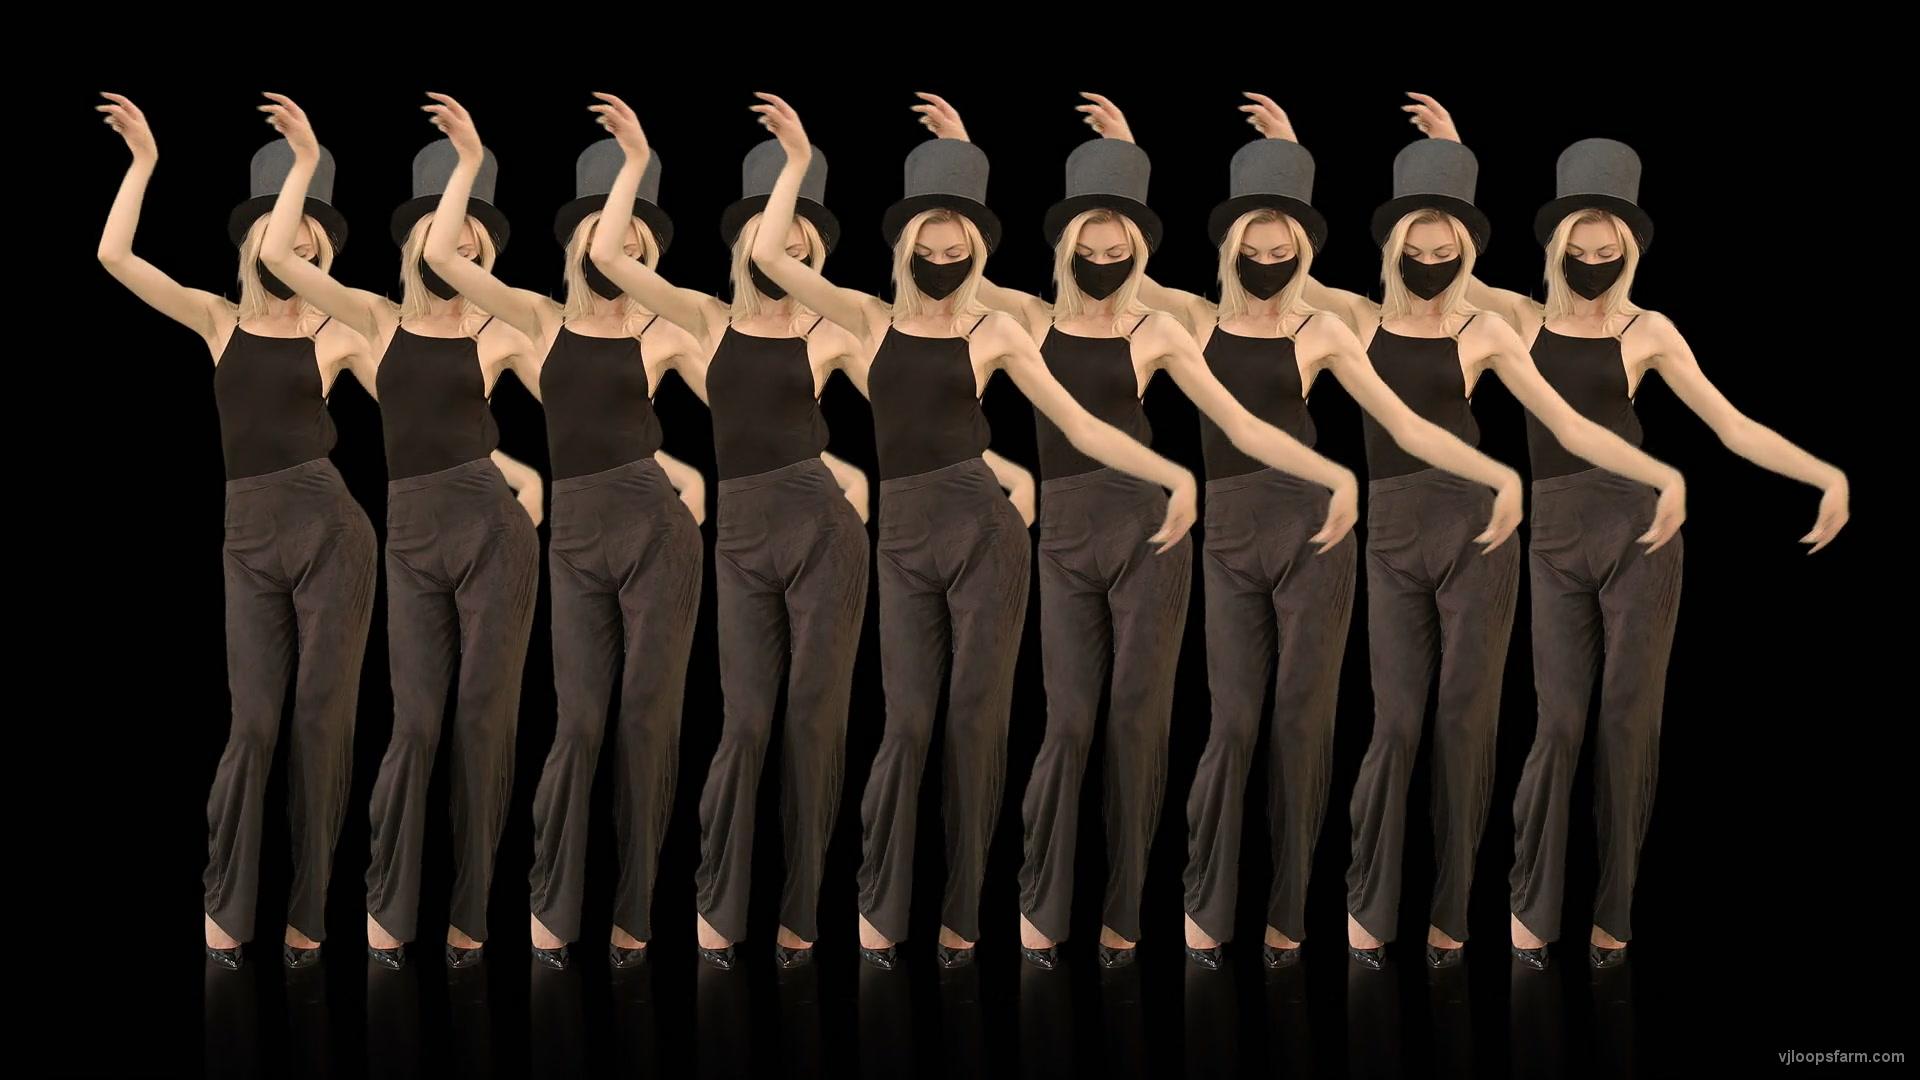 vj video background Beauty-Blonde-Girl-Team-in-Covid-19-black-mask-dancing-on-black-background-4K-Video-VJ-Footage-1920_003